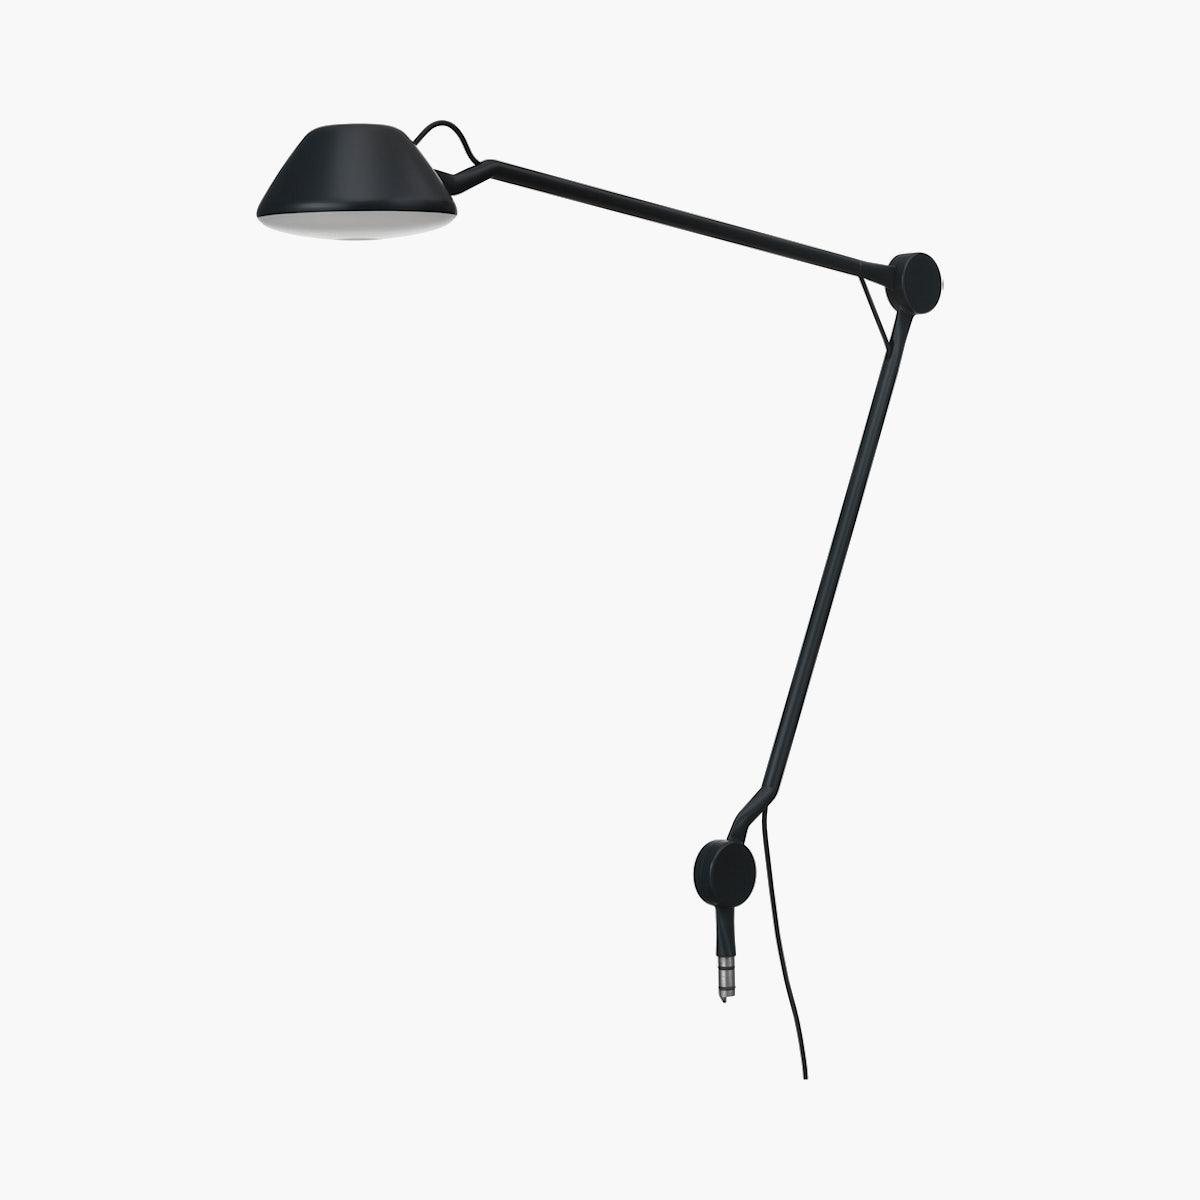 AQ01 Lamp